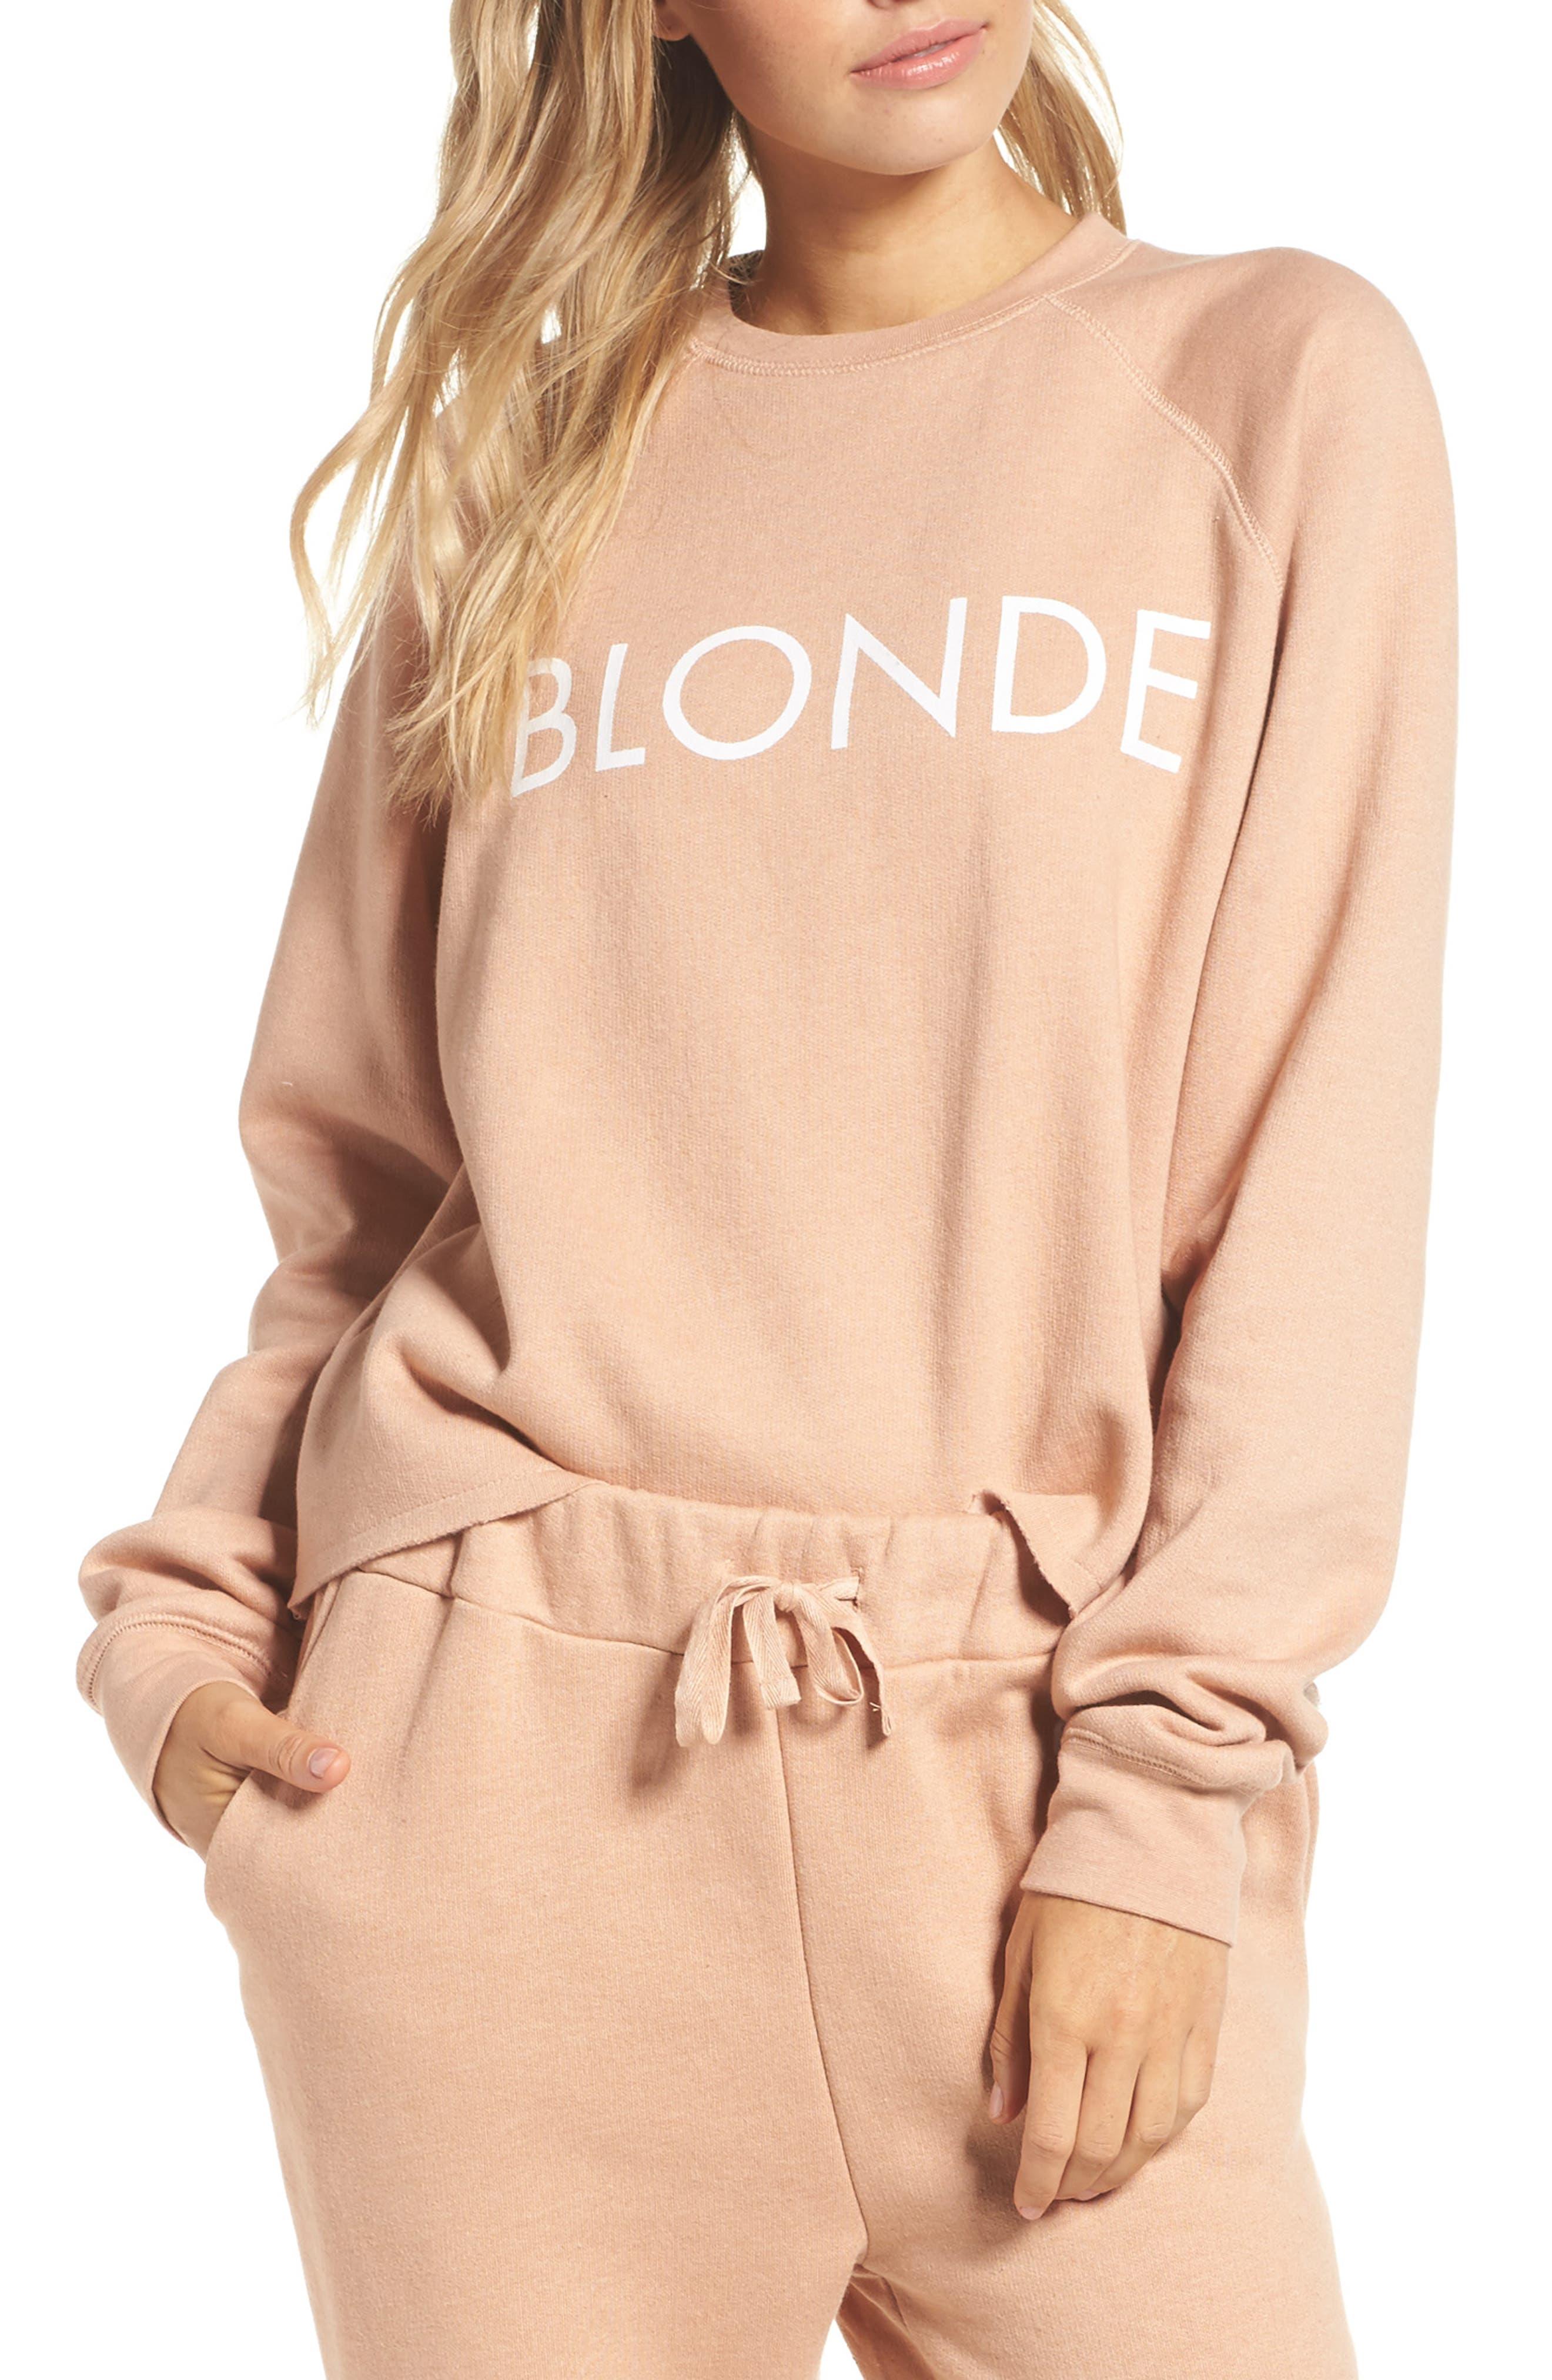 Middle Sister Blonde Sweatshirt,                         Main,                         color, Beige